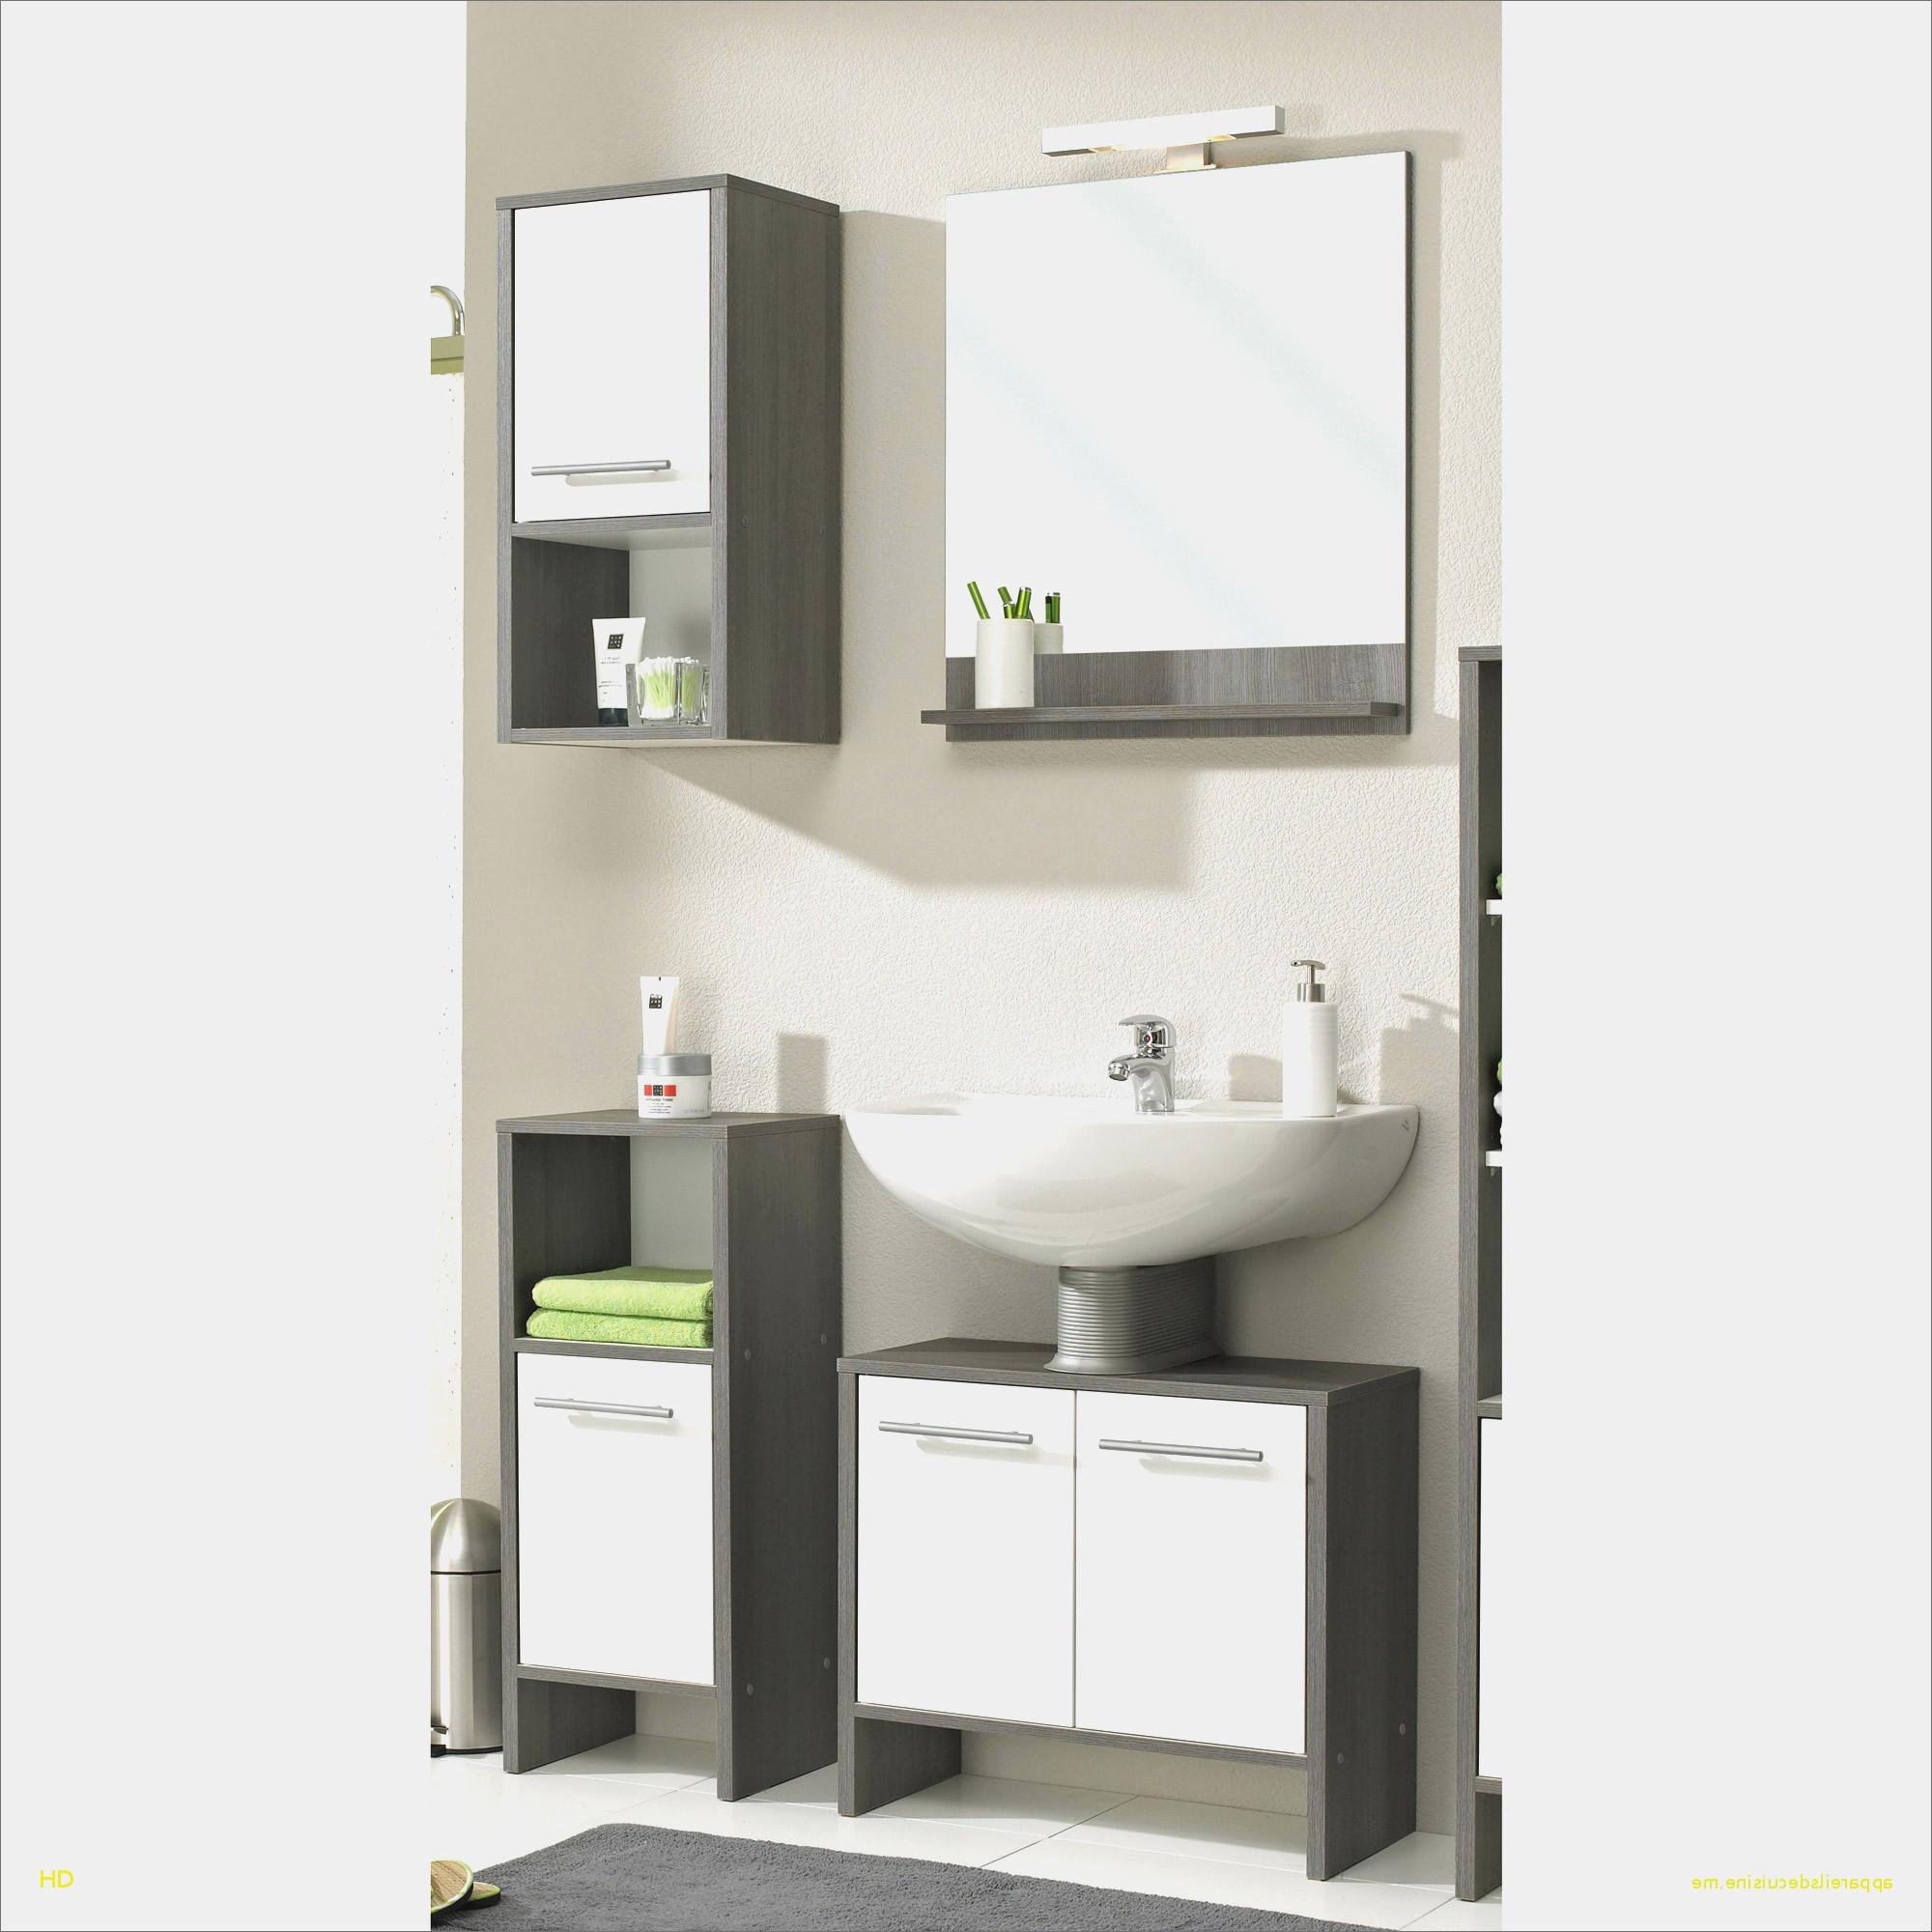 meuble haut miroir salle de bain conforama. Black Bedroom Furniture Sets. Home Design Ideas